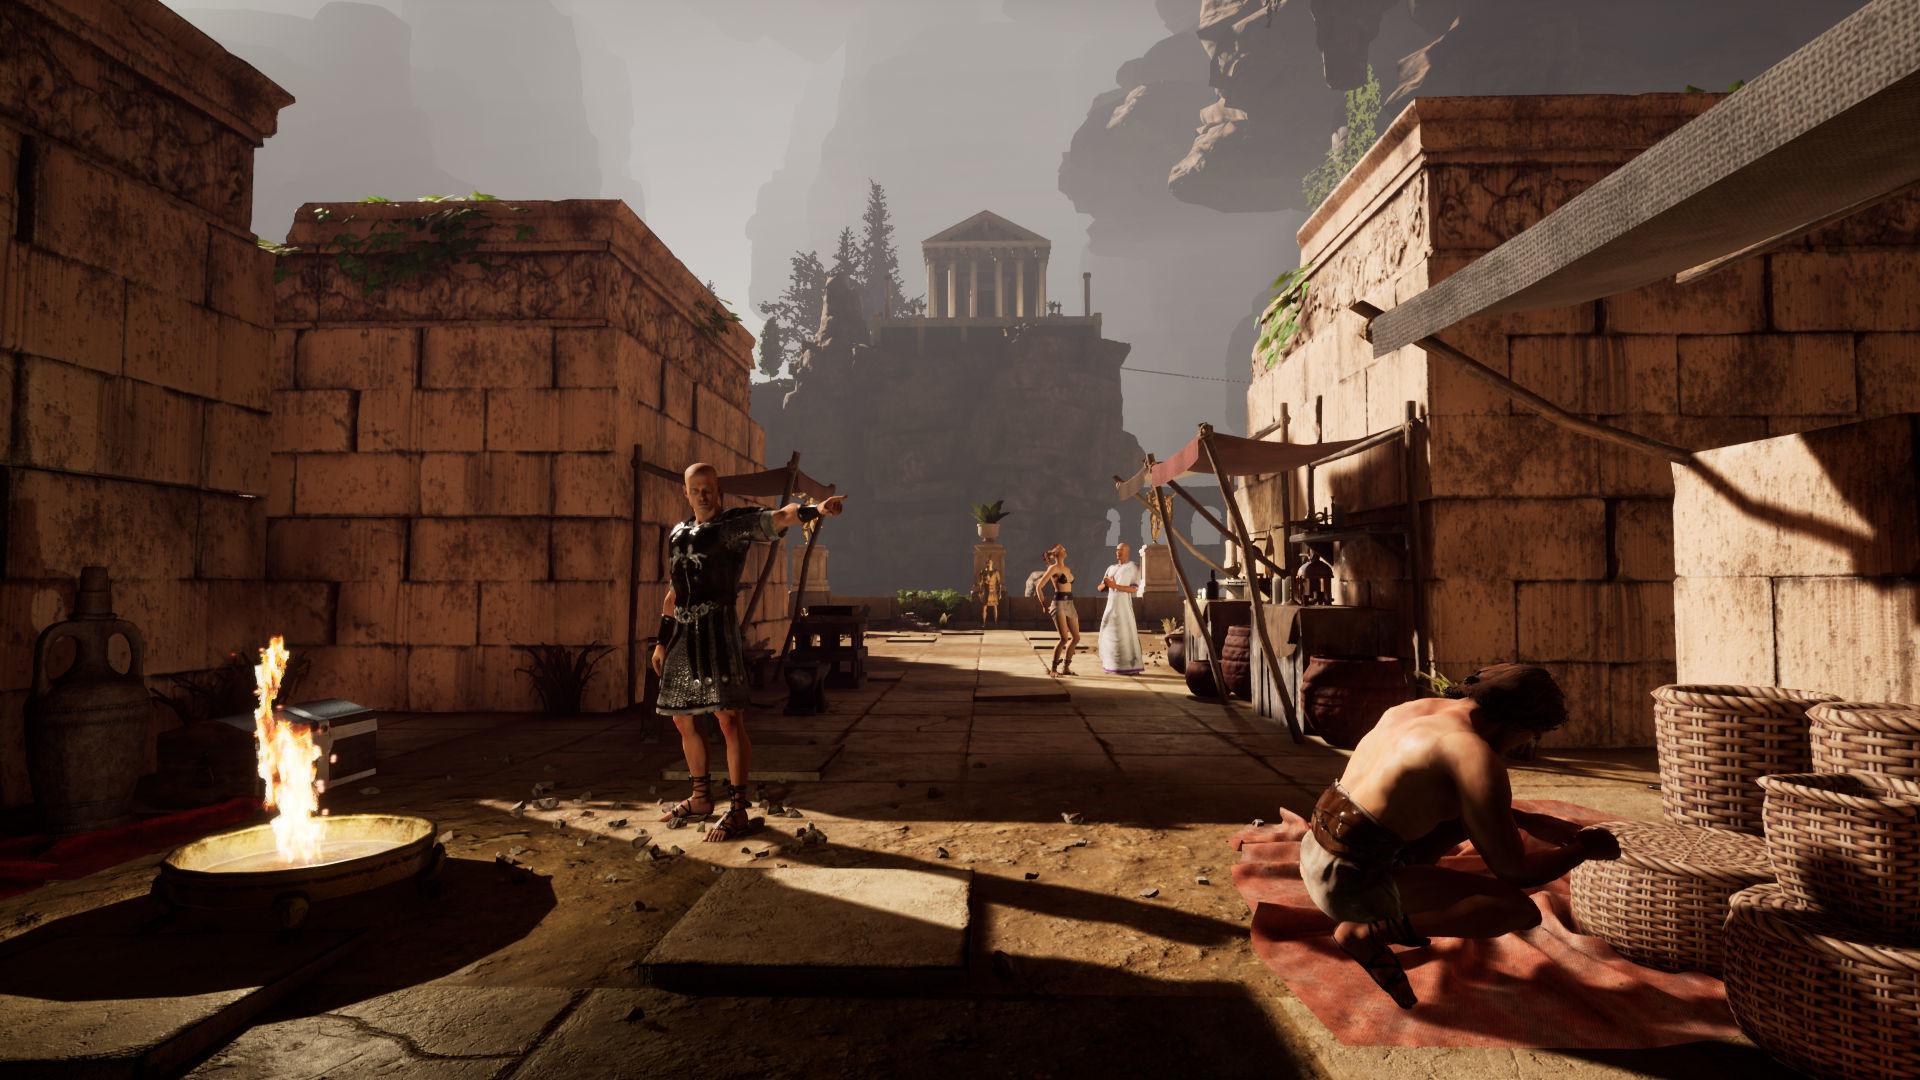 The Forgotten City on Steam